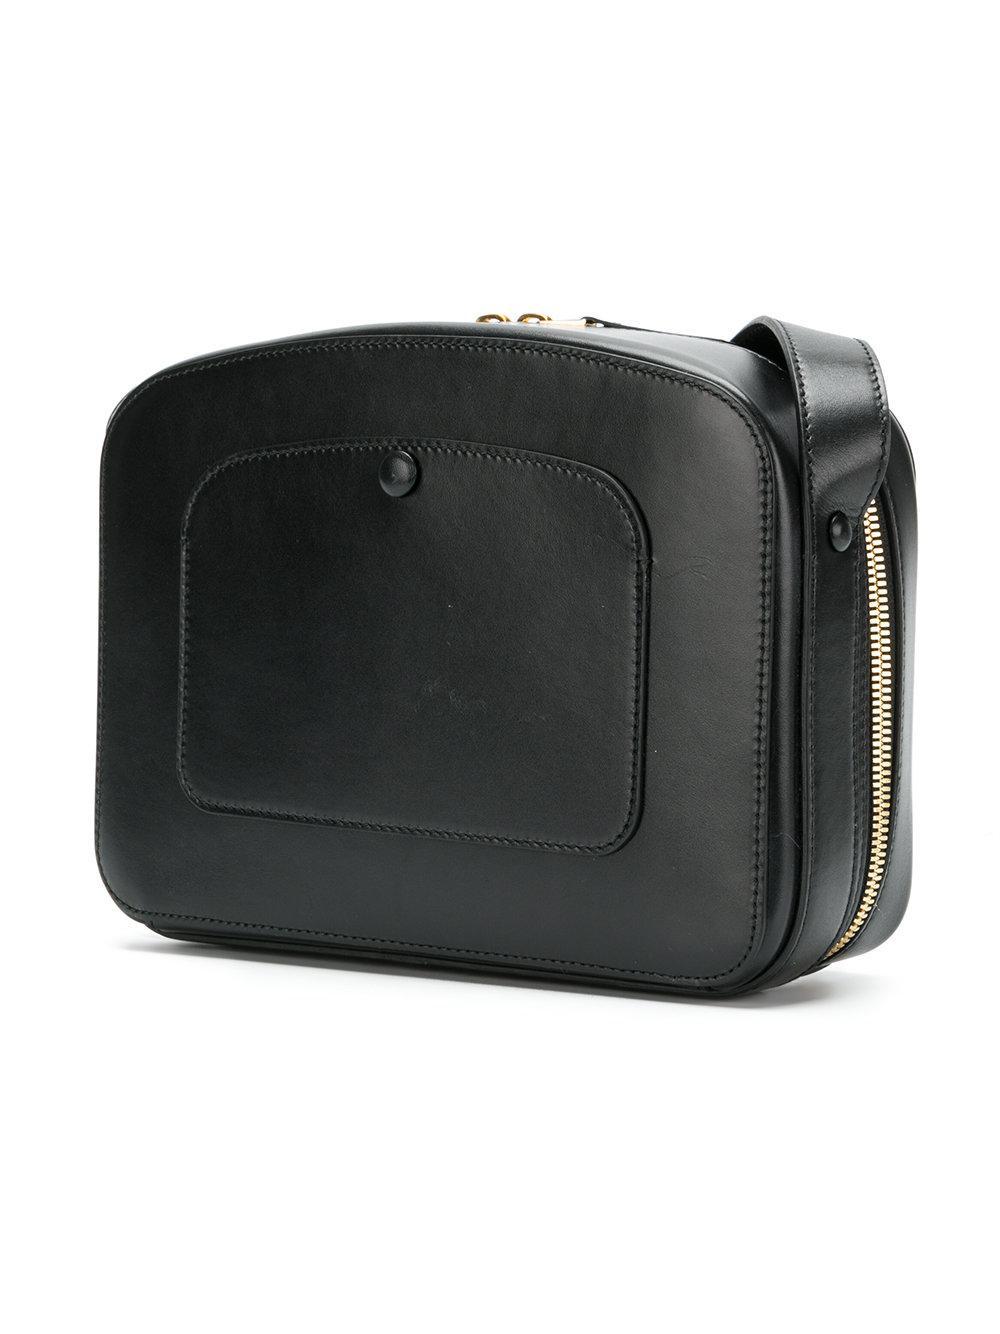 Black Camera Bag Victoria Beckham DrJMk